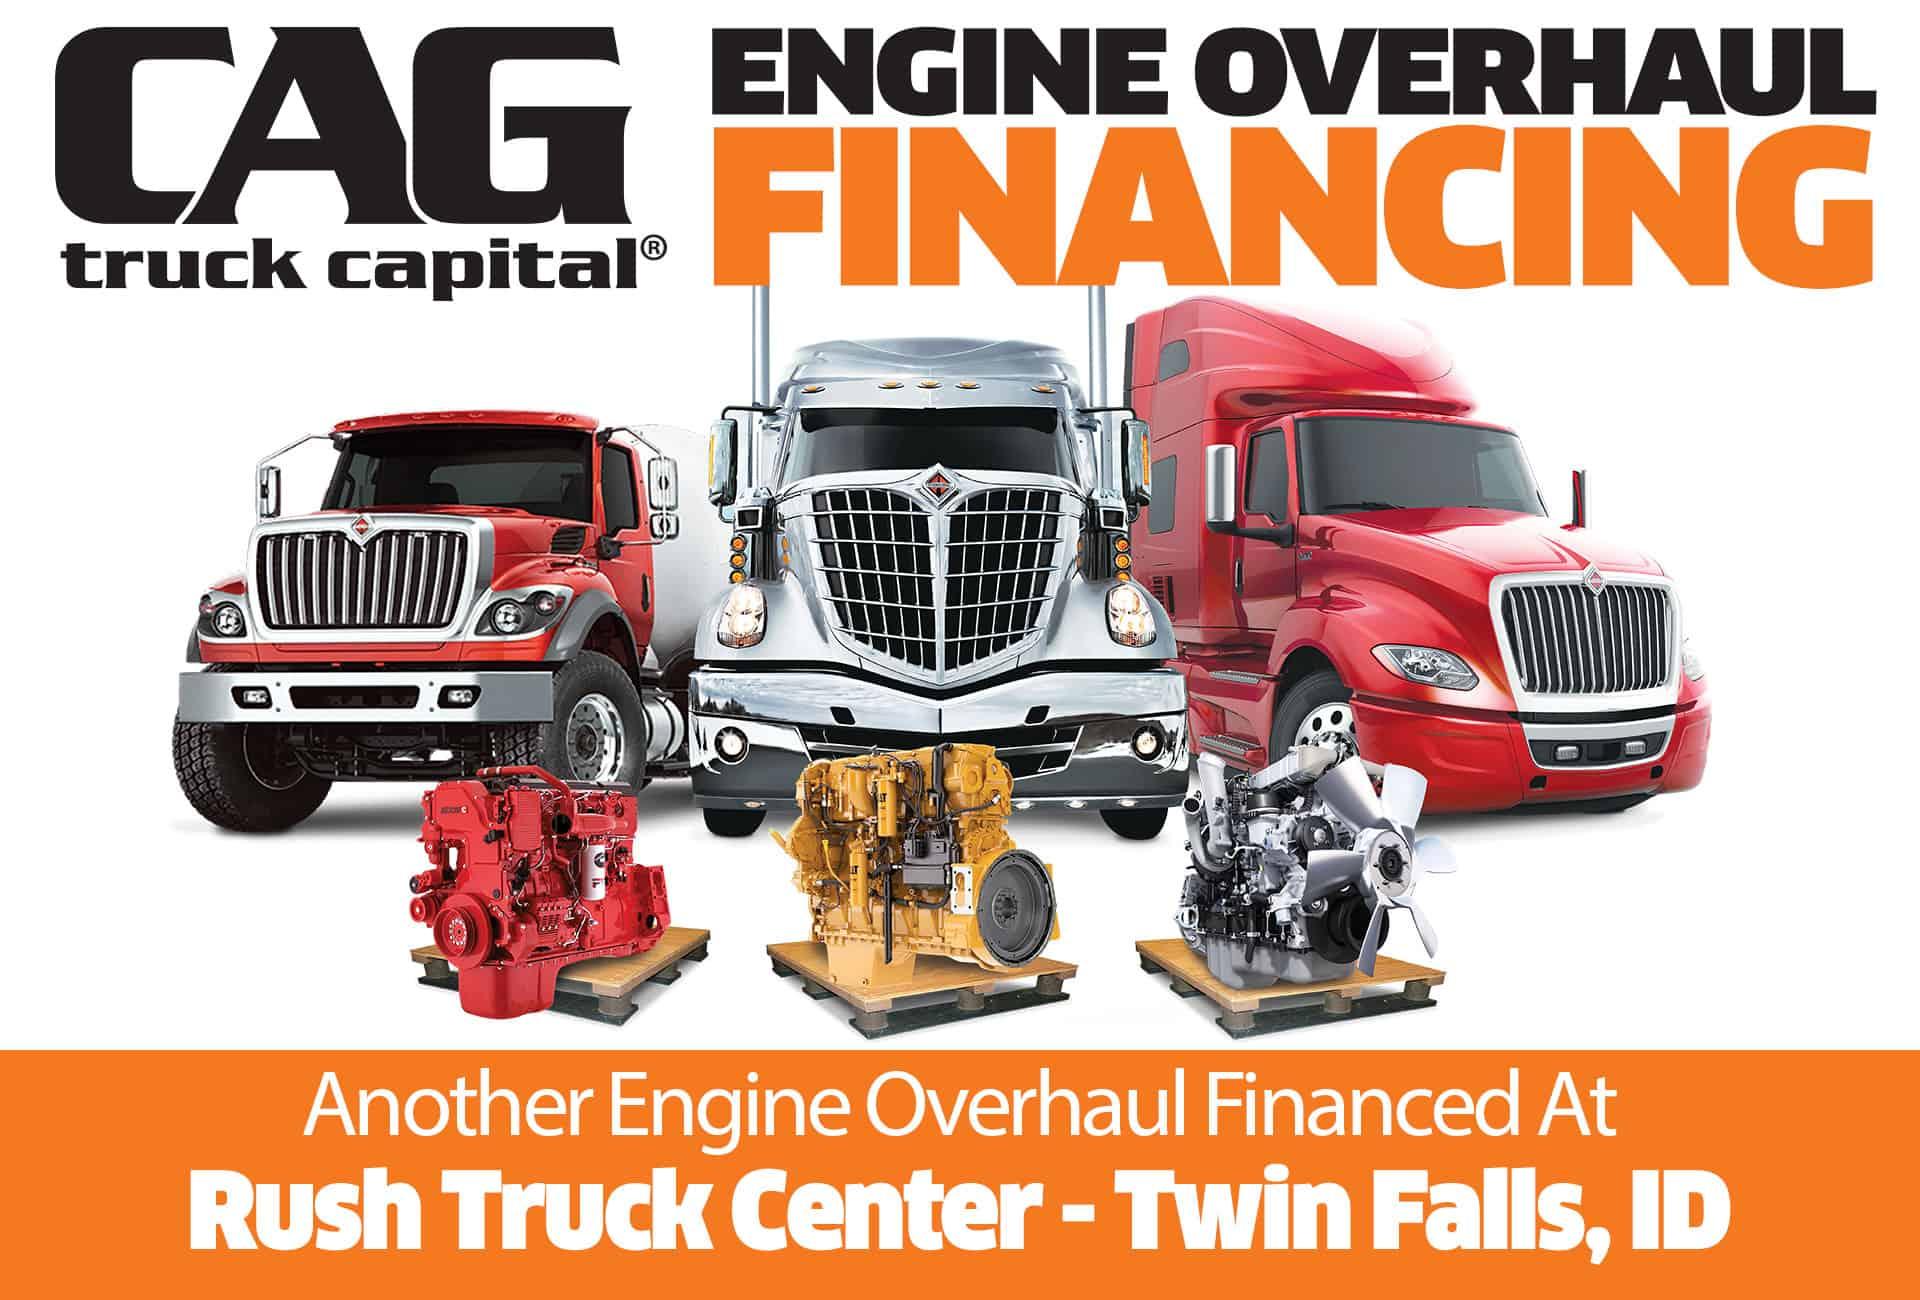 Rush Truck Center Twin Falls ID